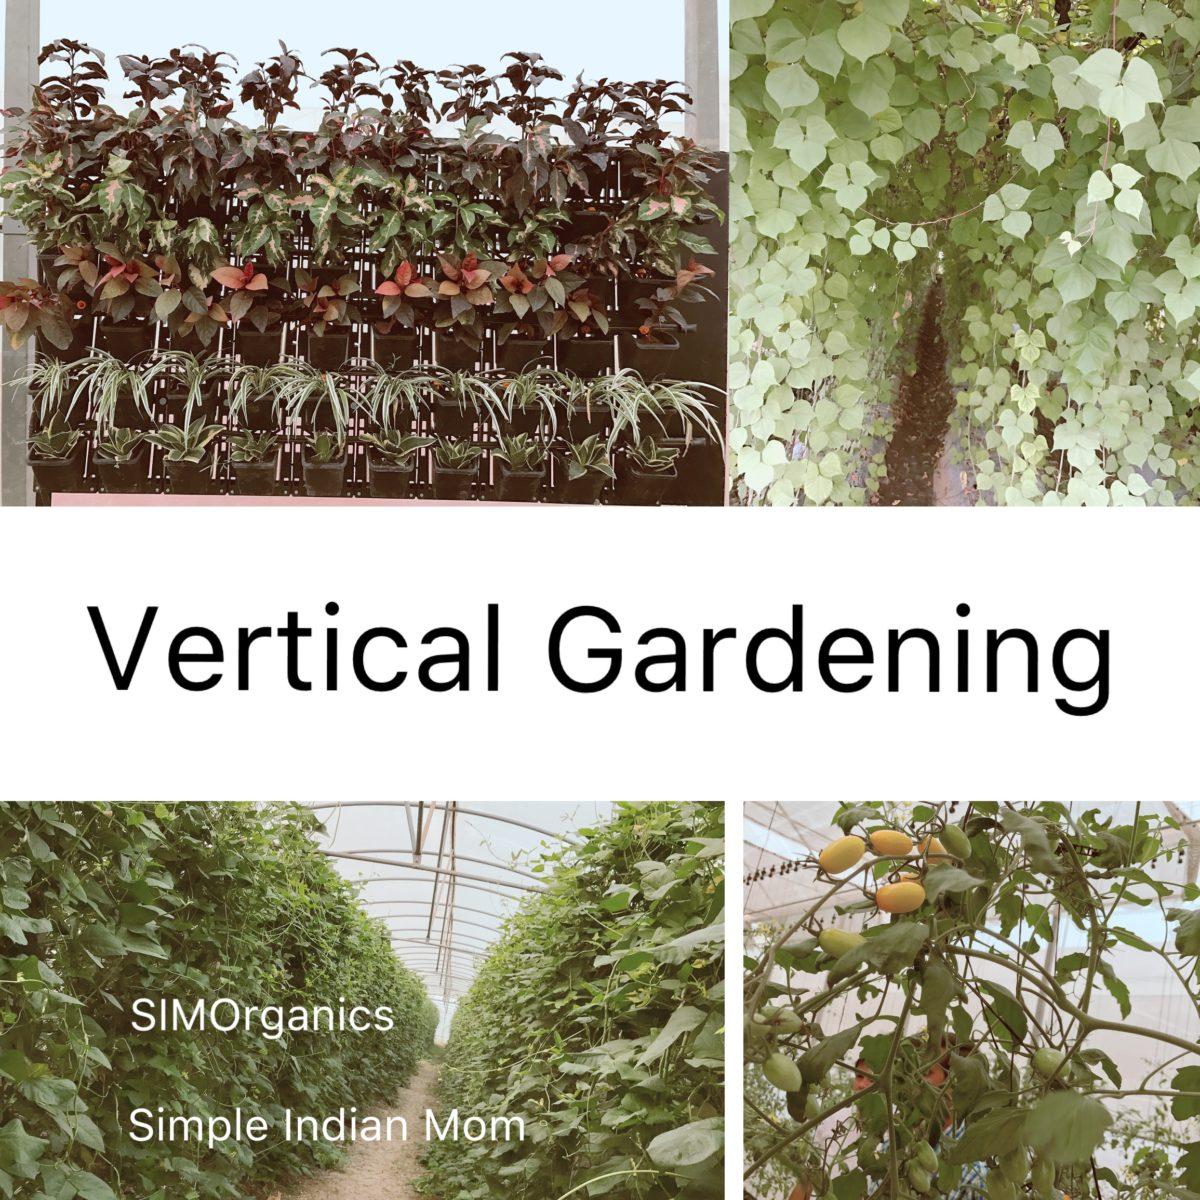 Vertical Gadening - Basics to Grow Your Own Veggies